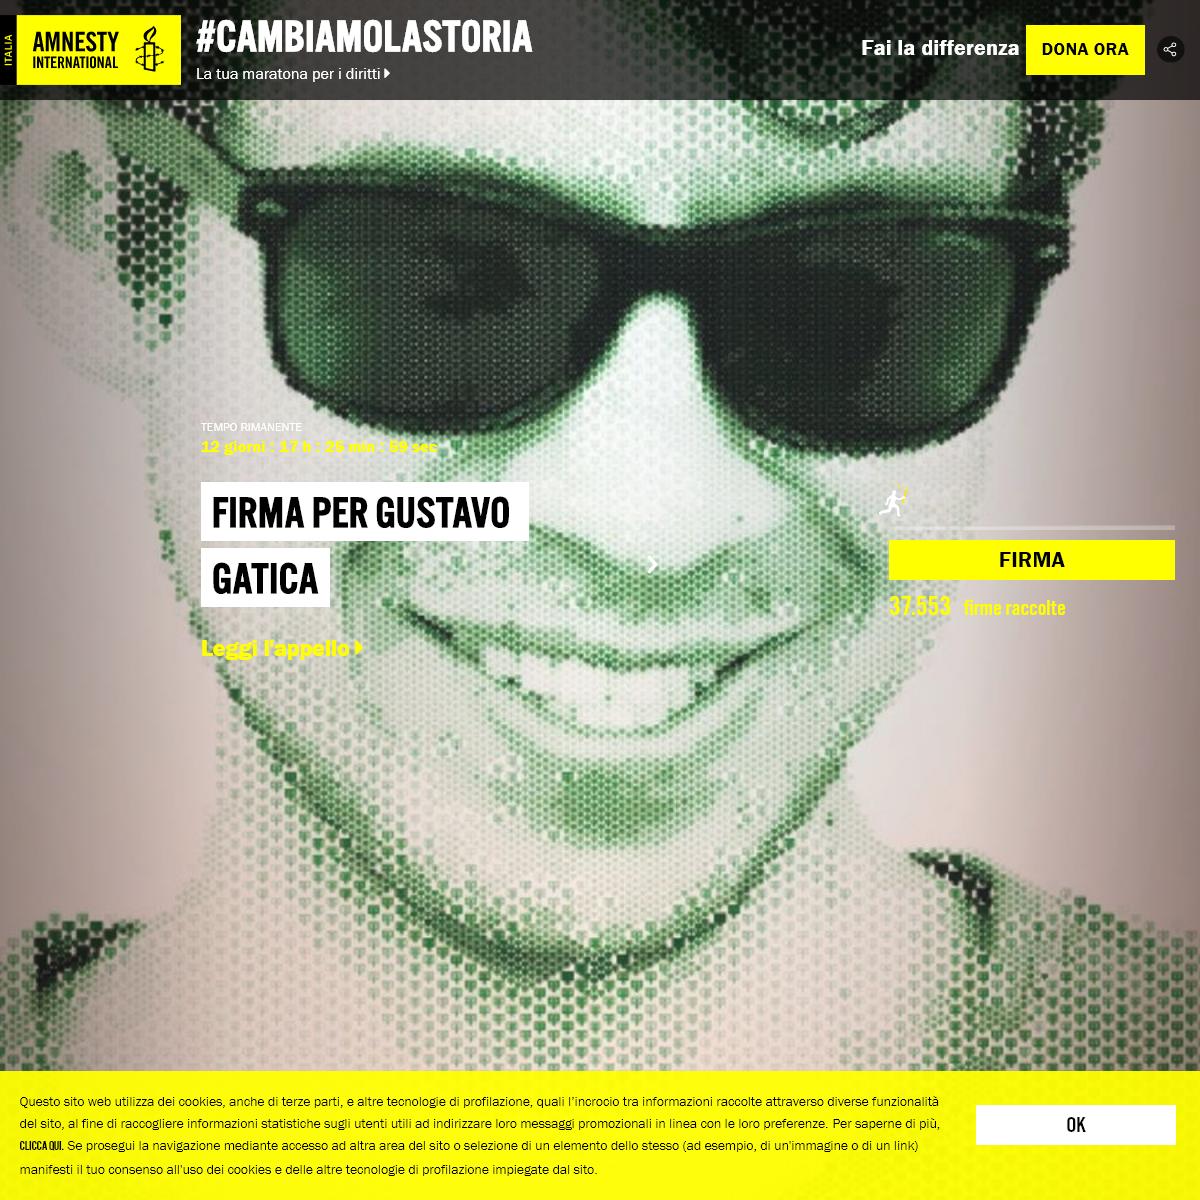 #Cambiamolastoria - Amnesty International Italia